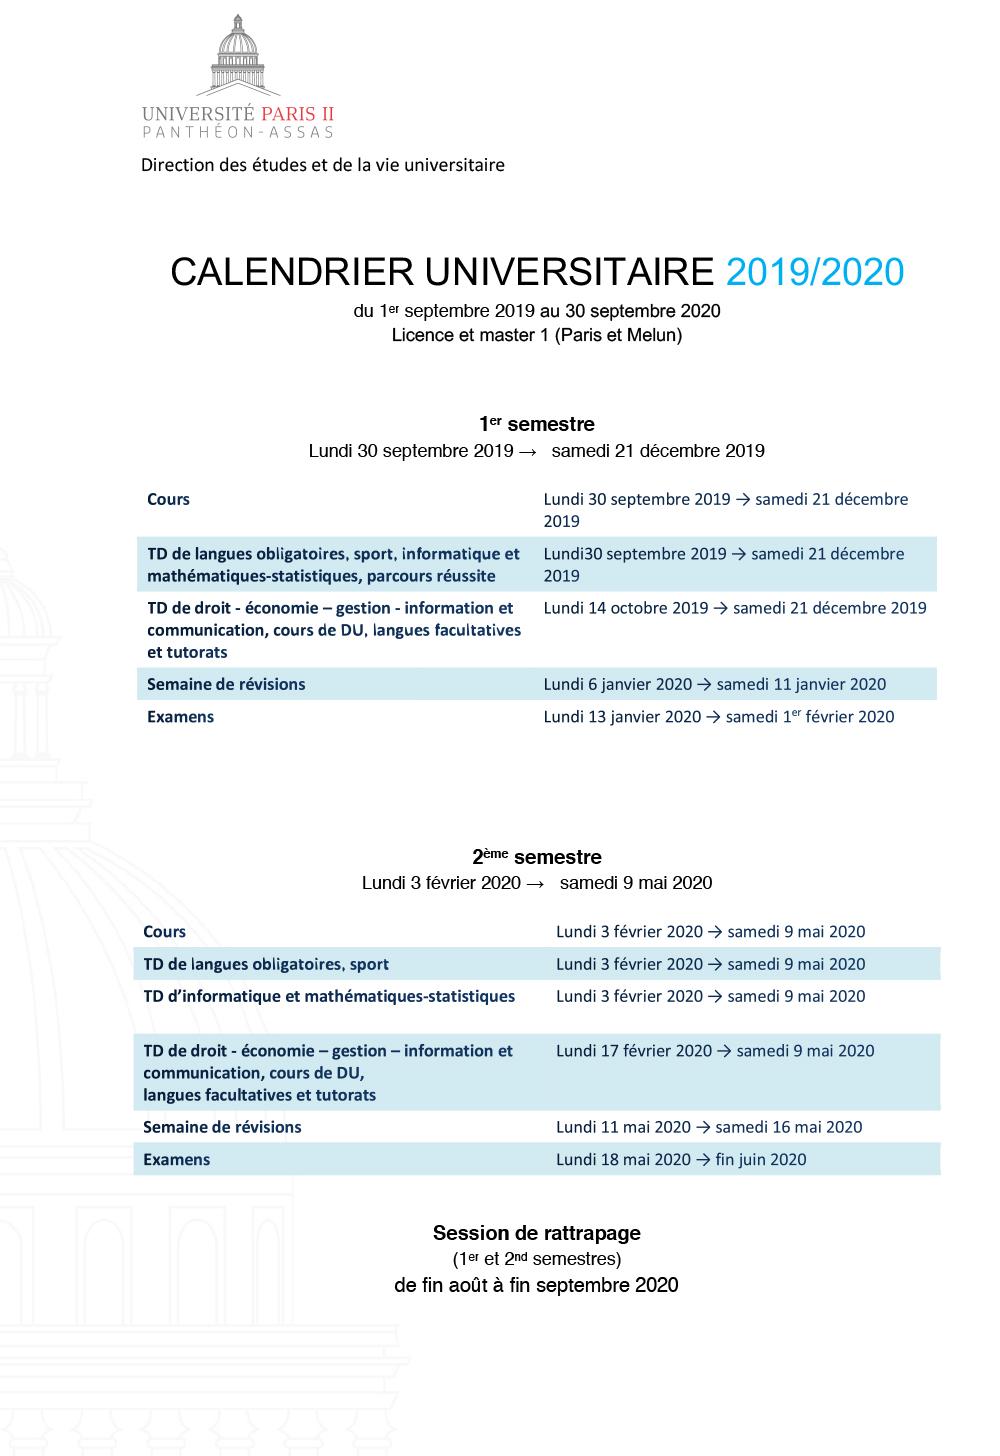 Calendrier universitaire 2019-2020 licence et master 1